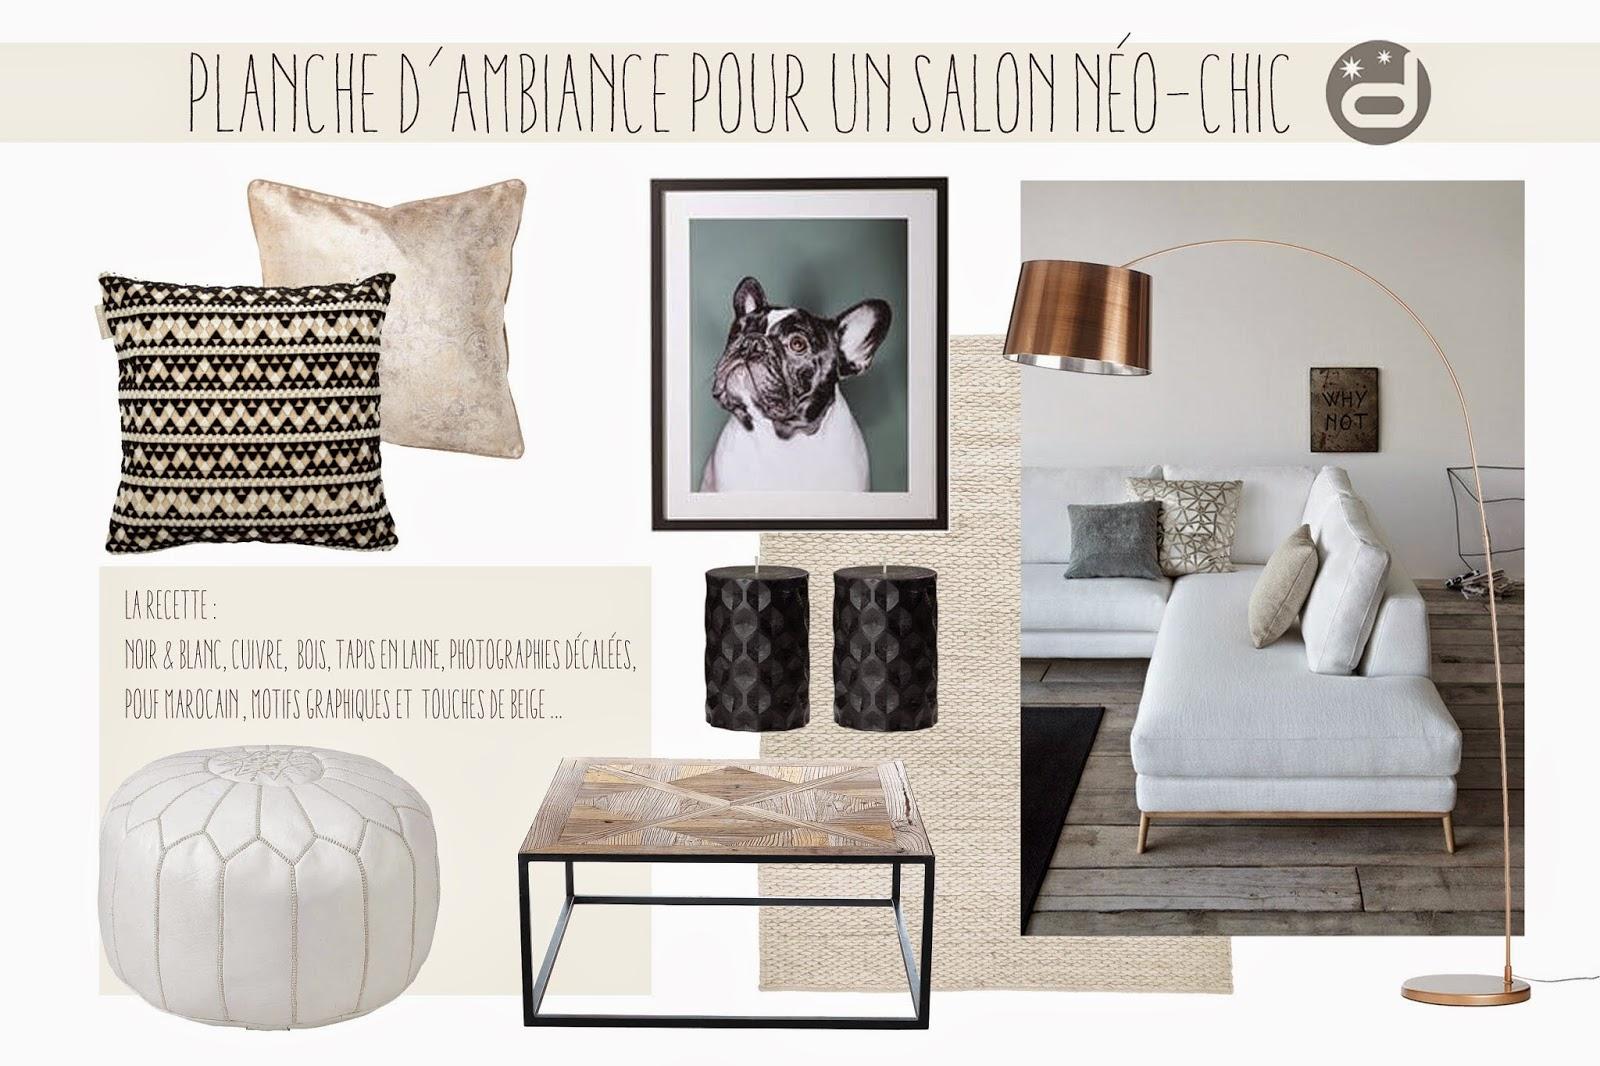 Divin 39 Id Le Blog D Co Planche D 39 Ambiance Pour Un Salon N O Chic Neo Chic Living Room Mood Board